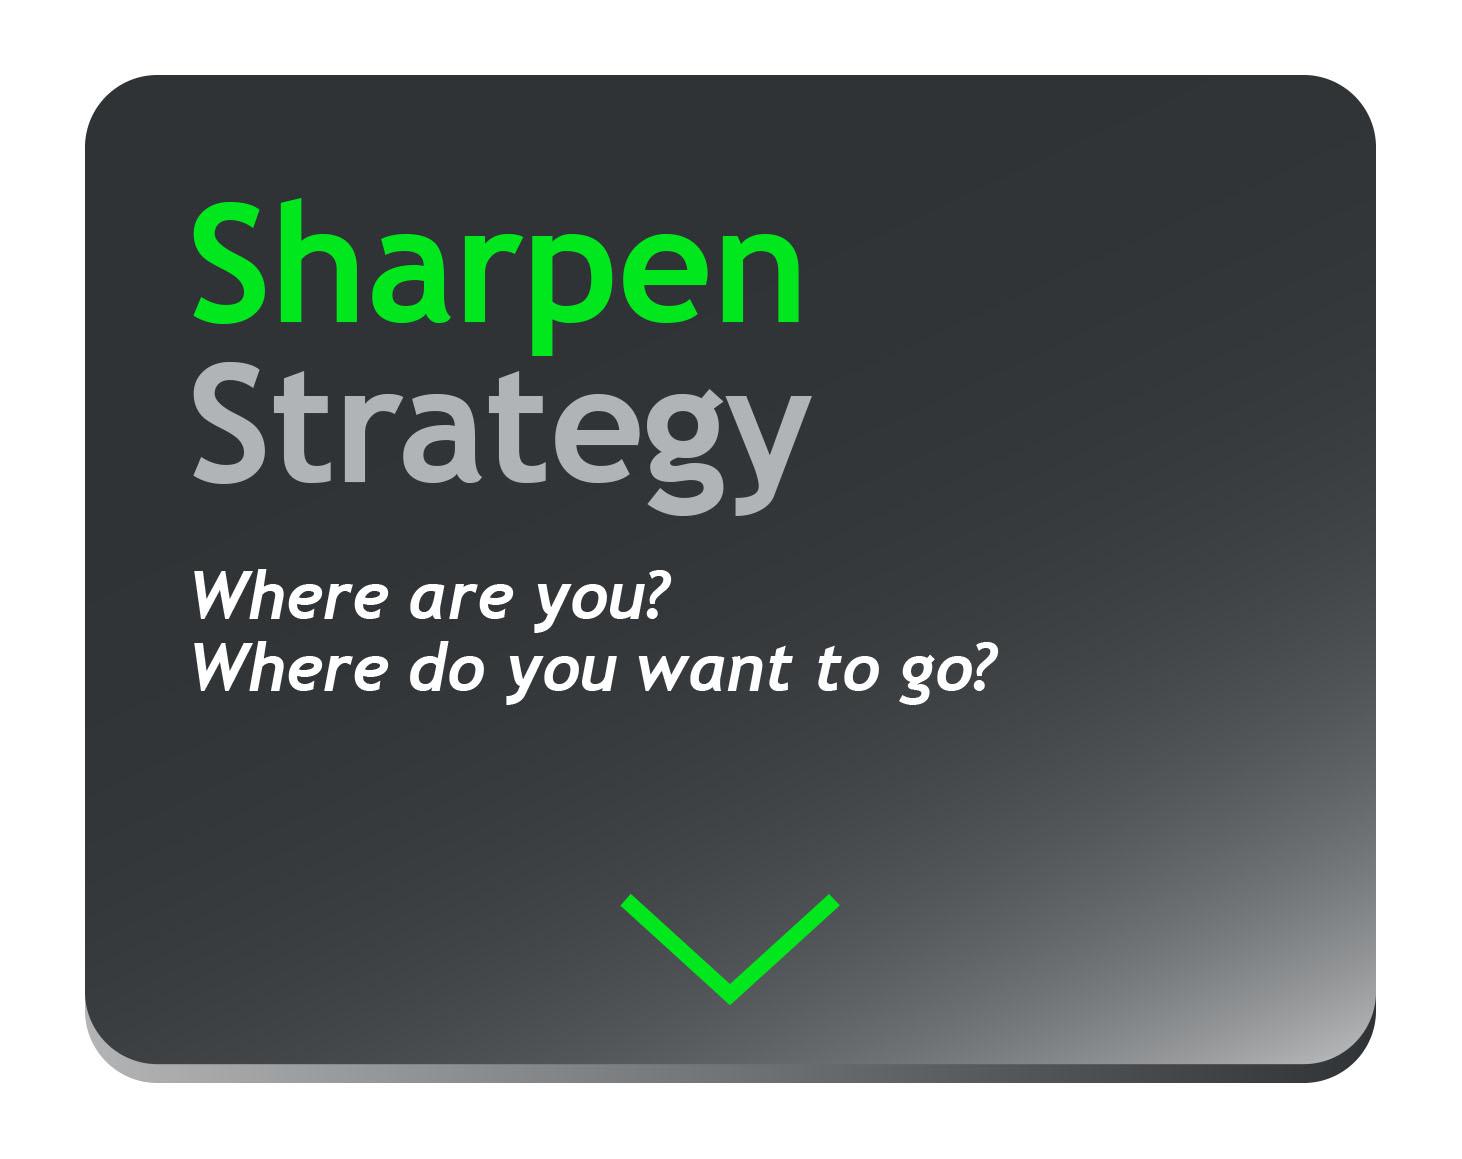 sharpen-strategy2.jpg